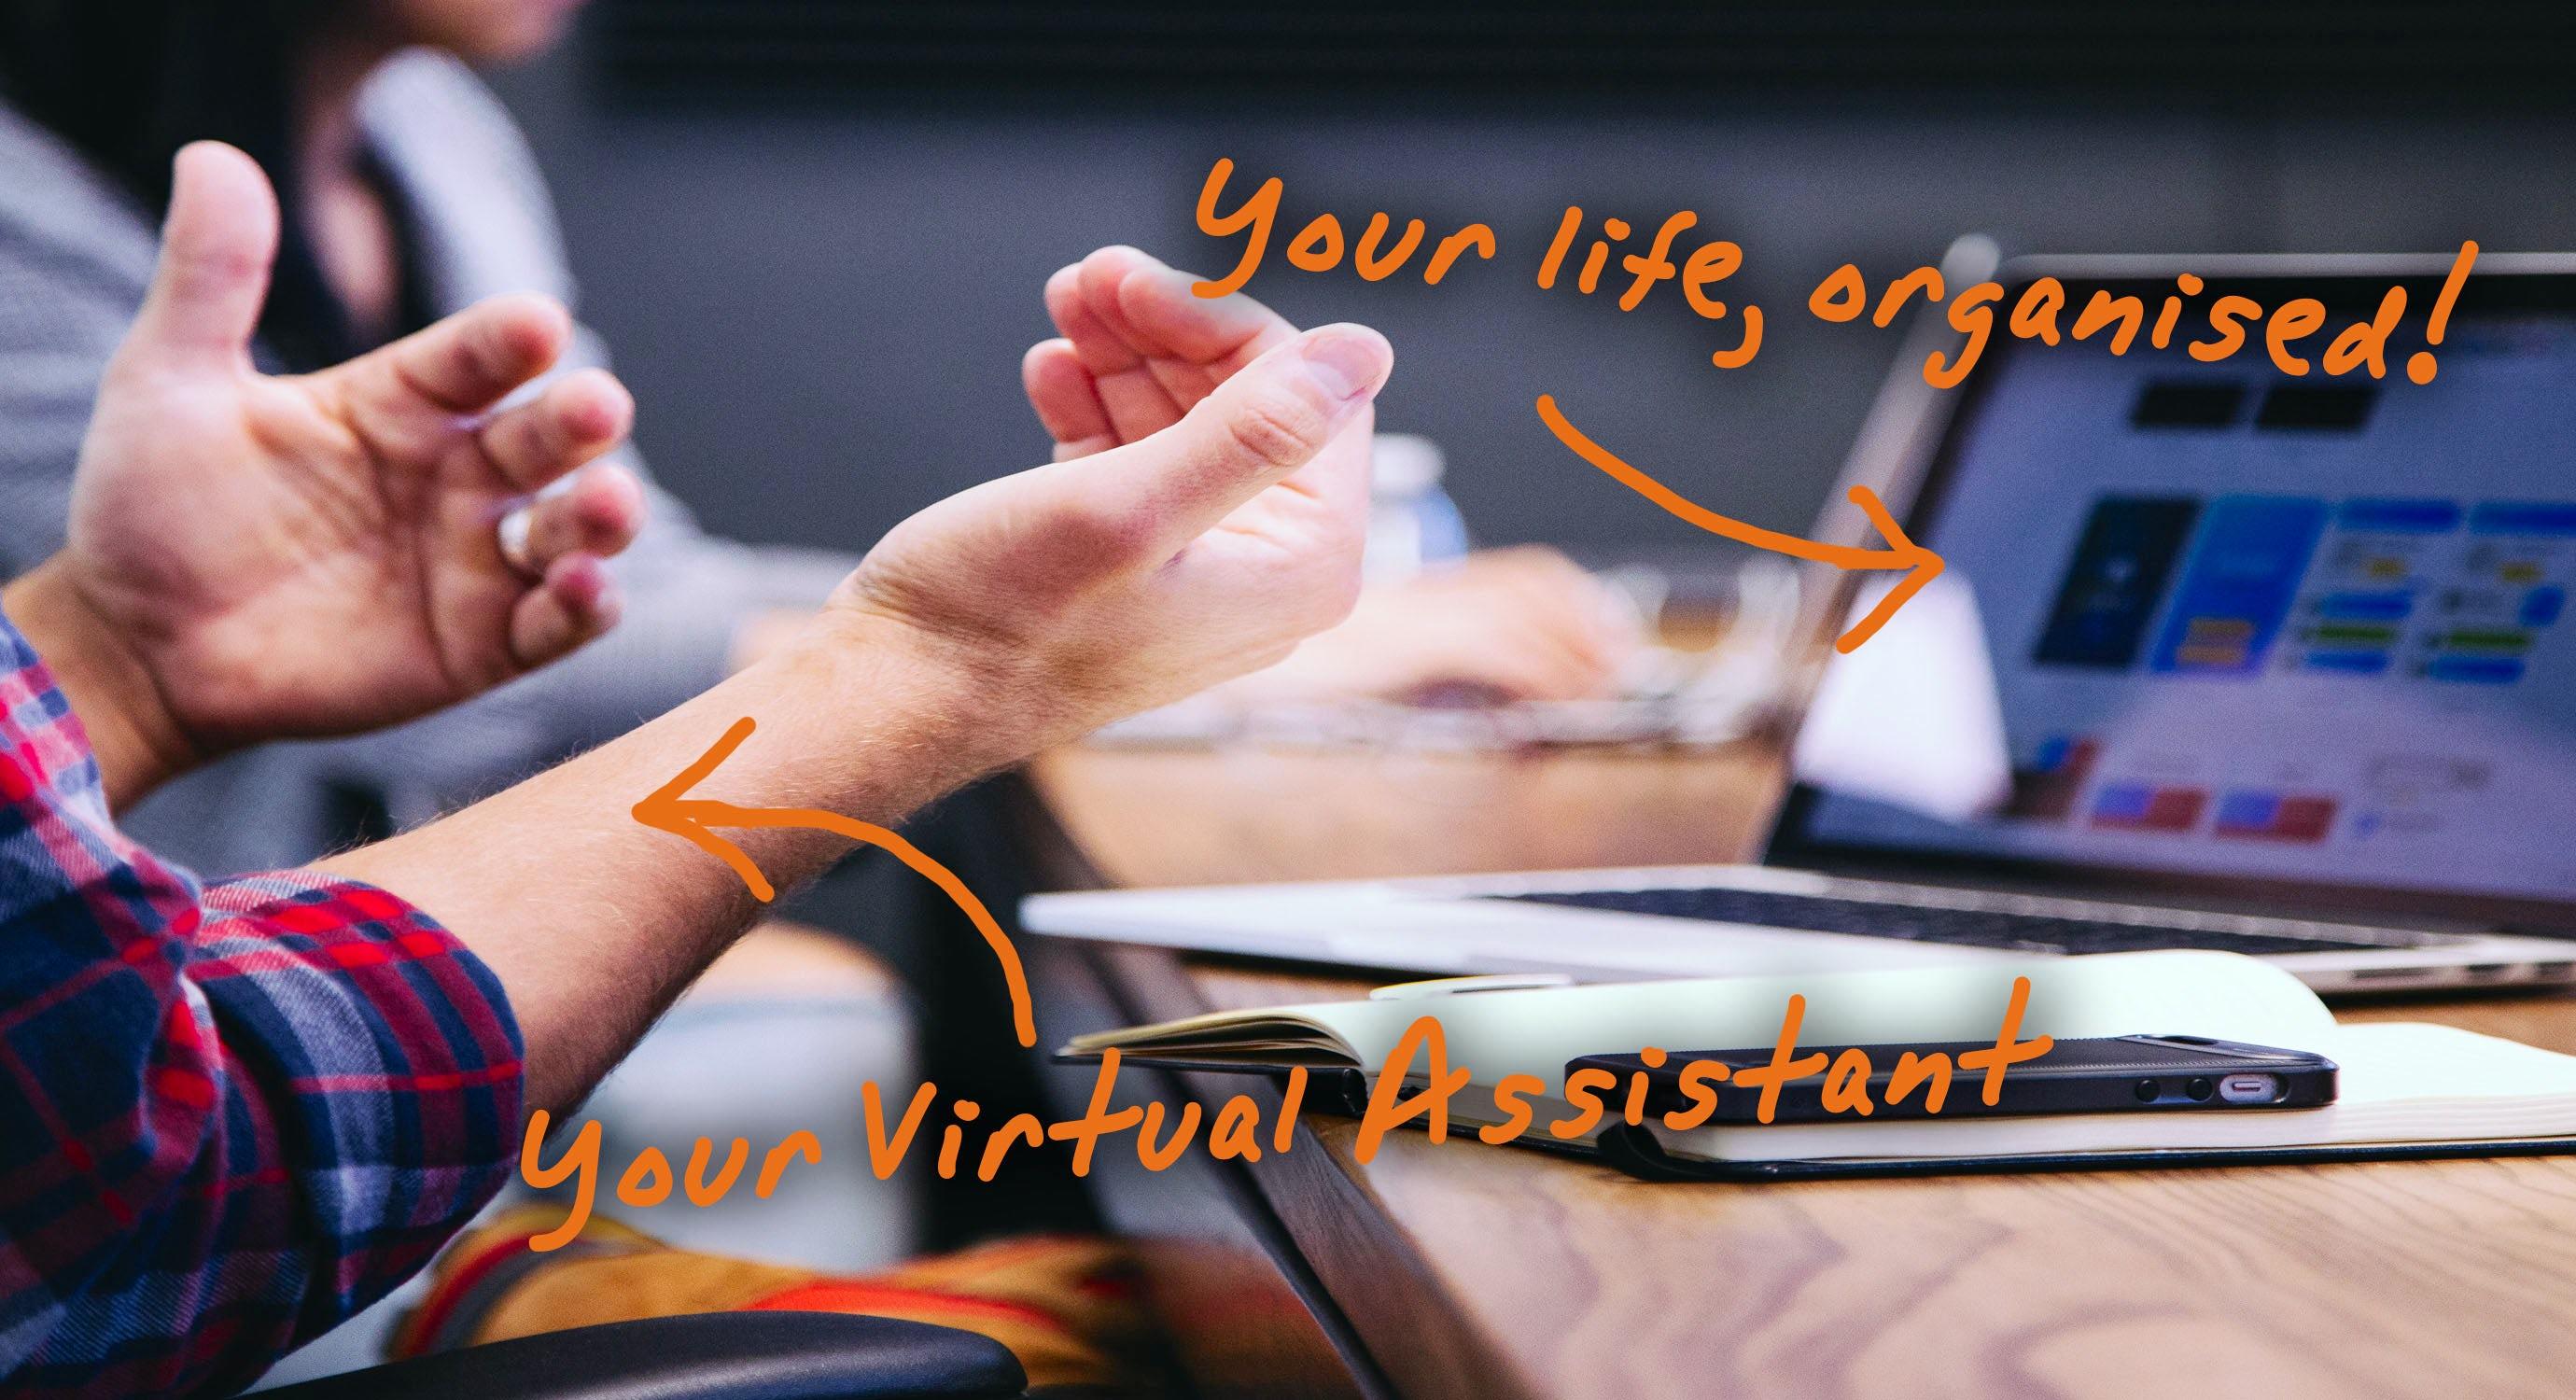 virtual assistant organised